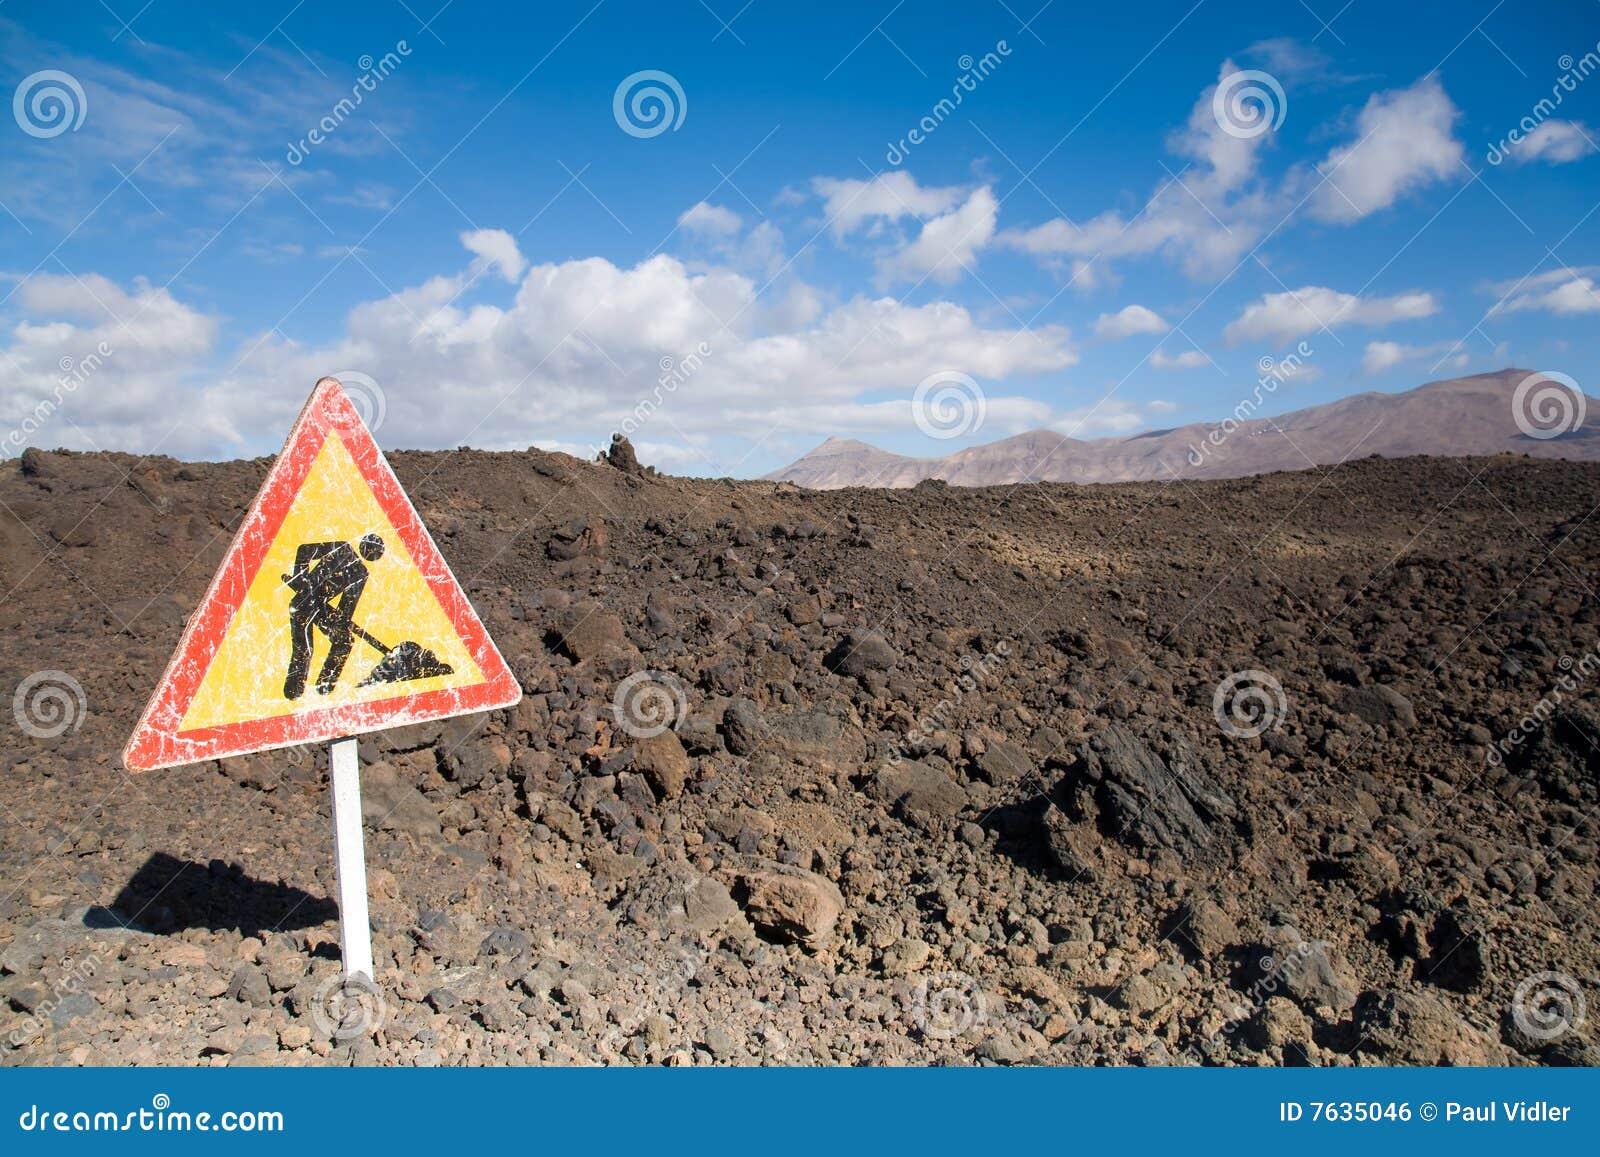 Lawowi roadworks